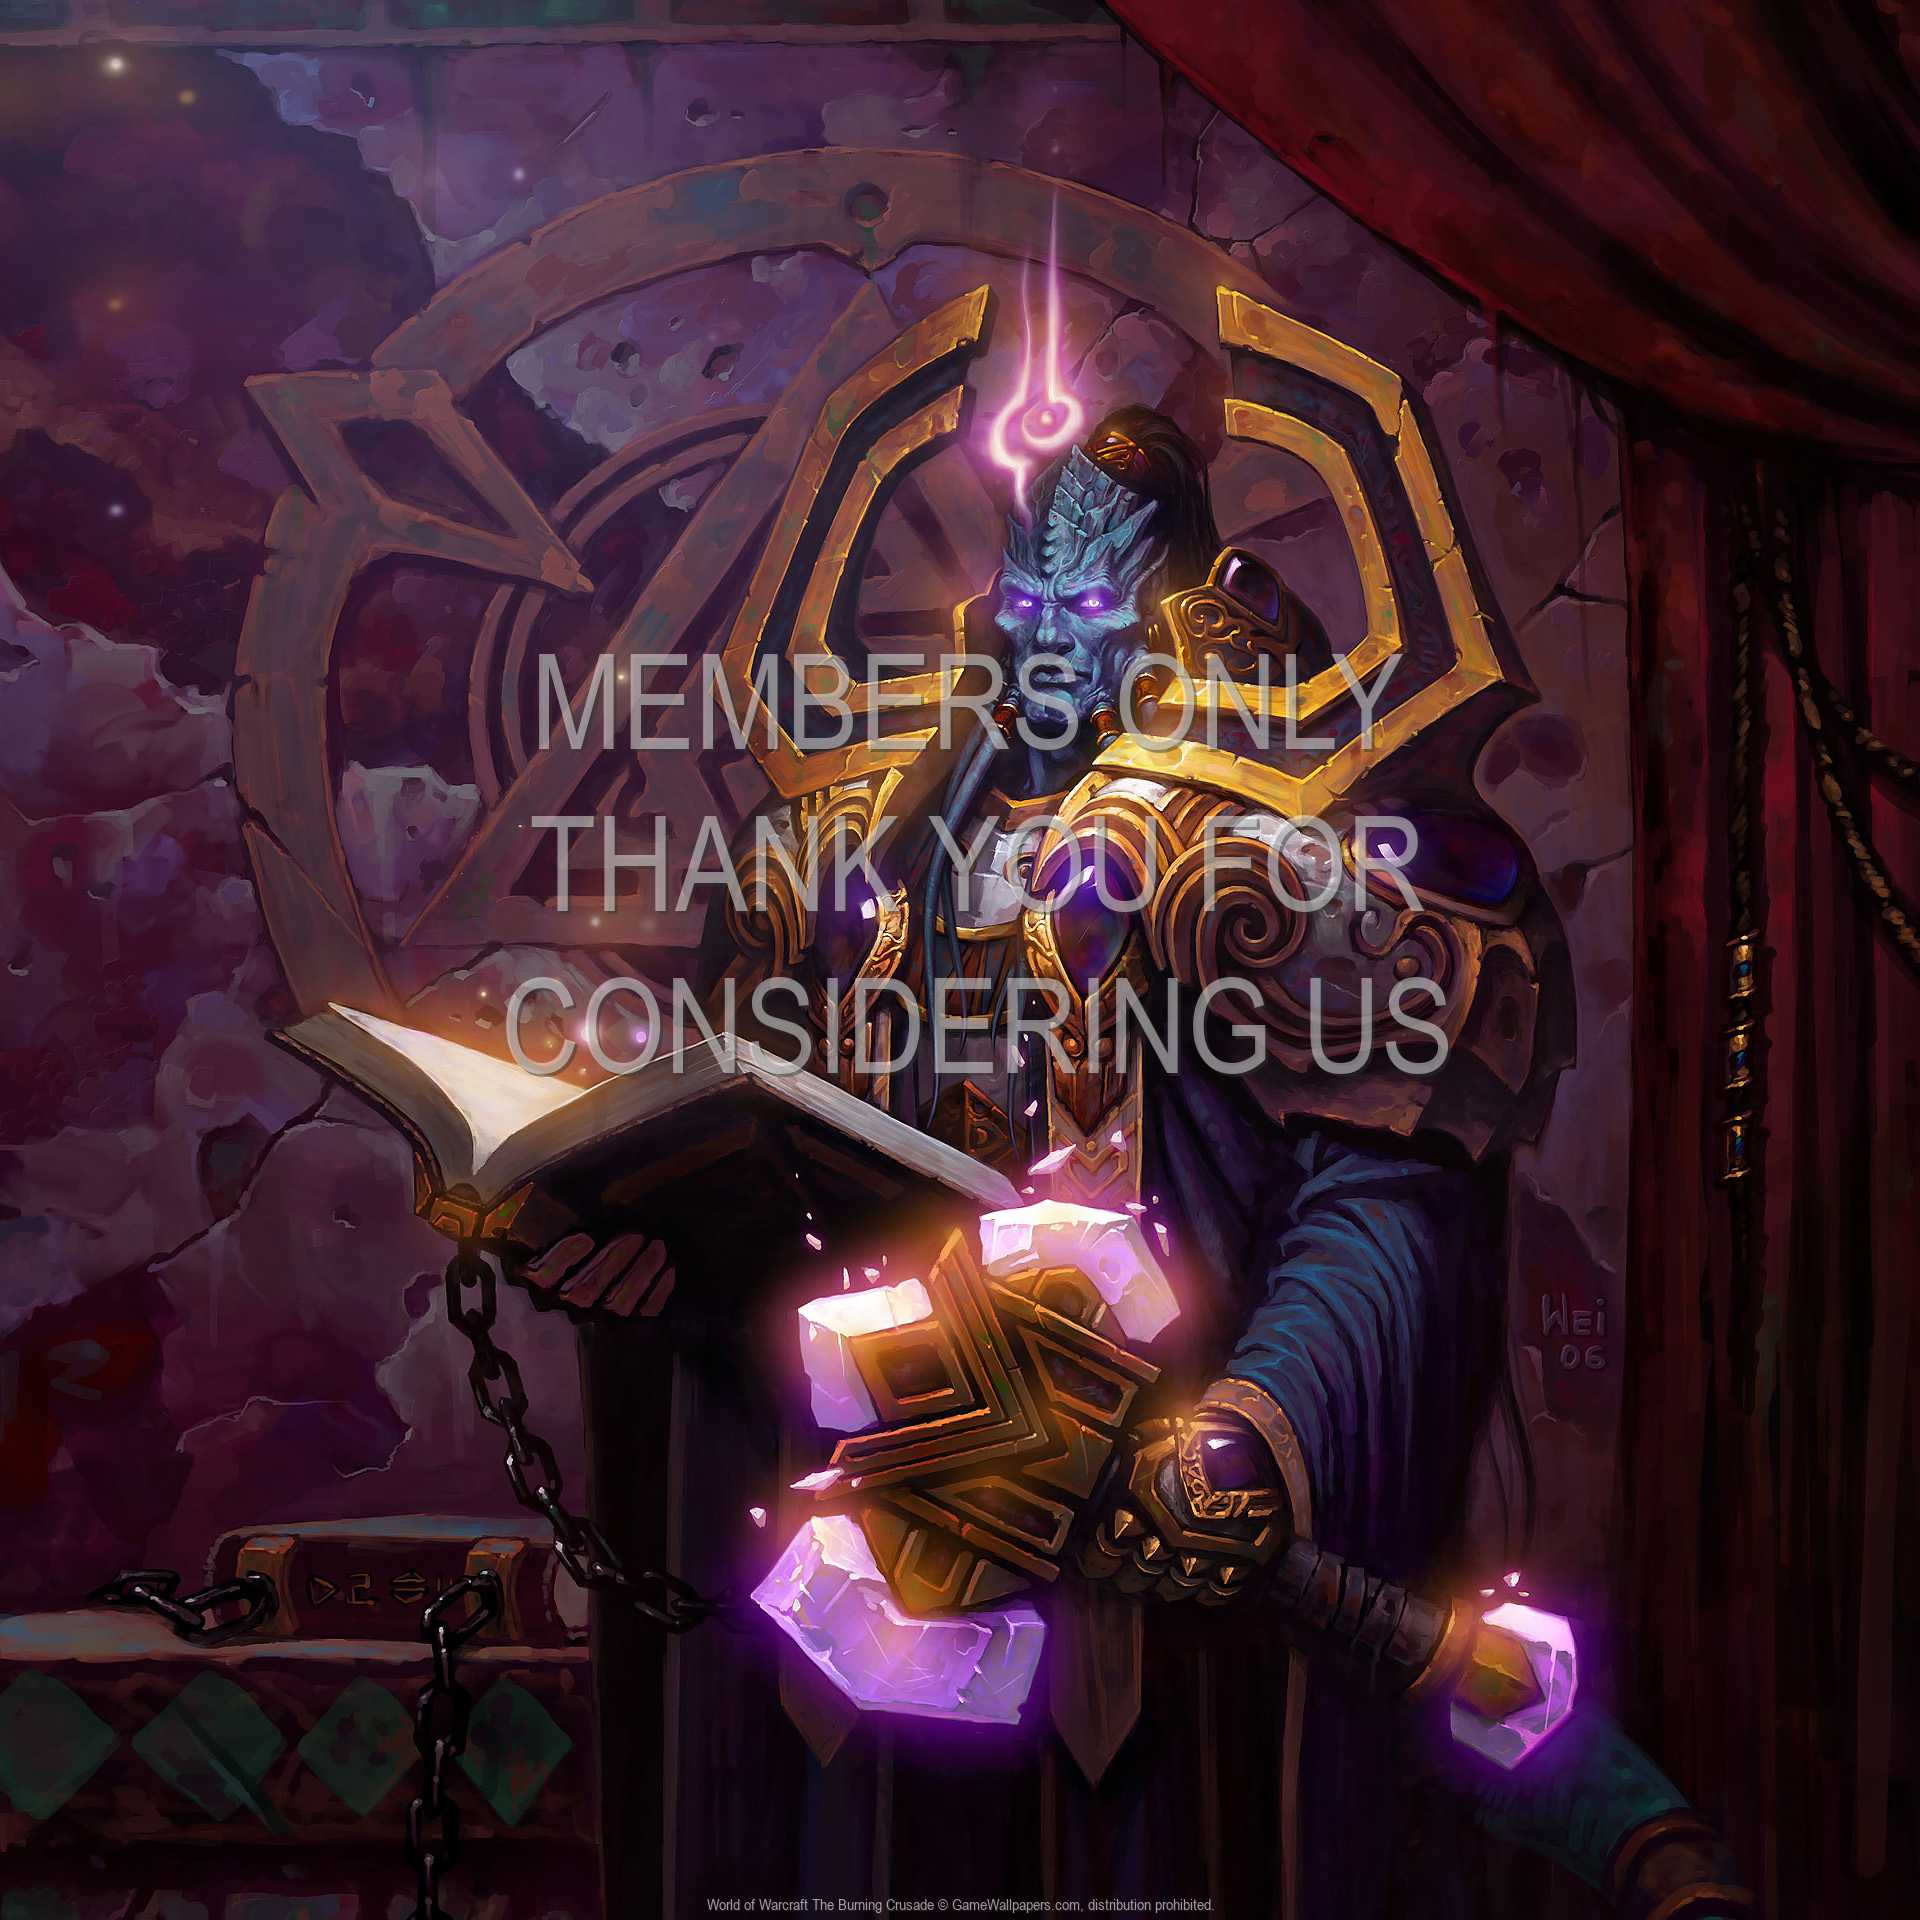 World of Warcraft: The Burning Crusade 1080p Horizontal Mobile wallpaper or background 07